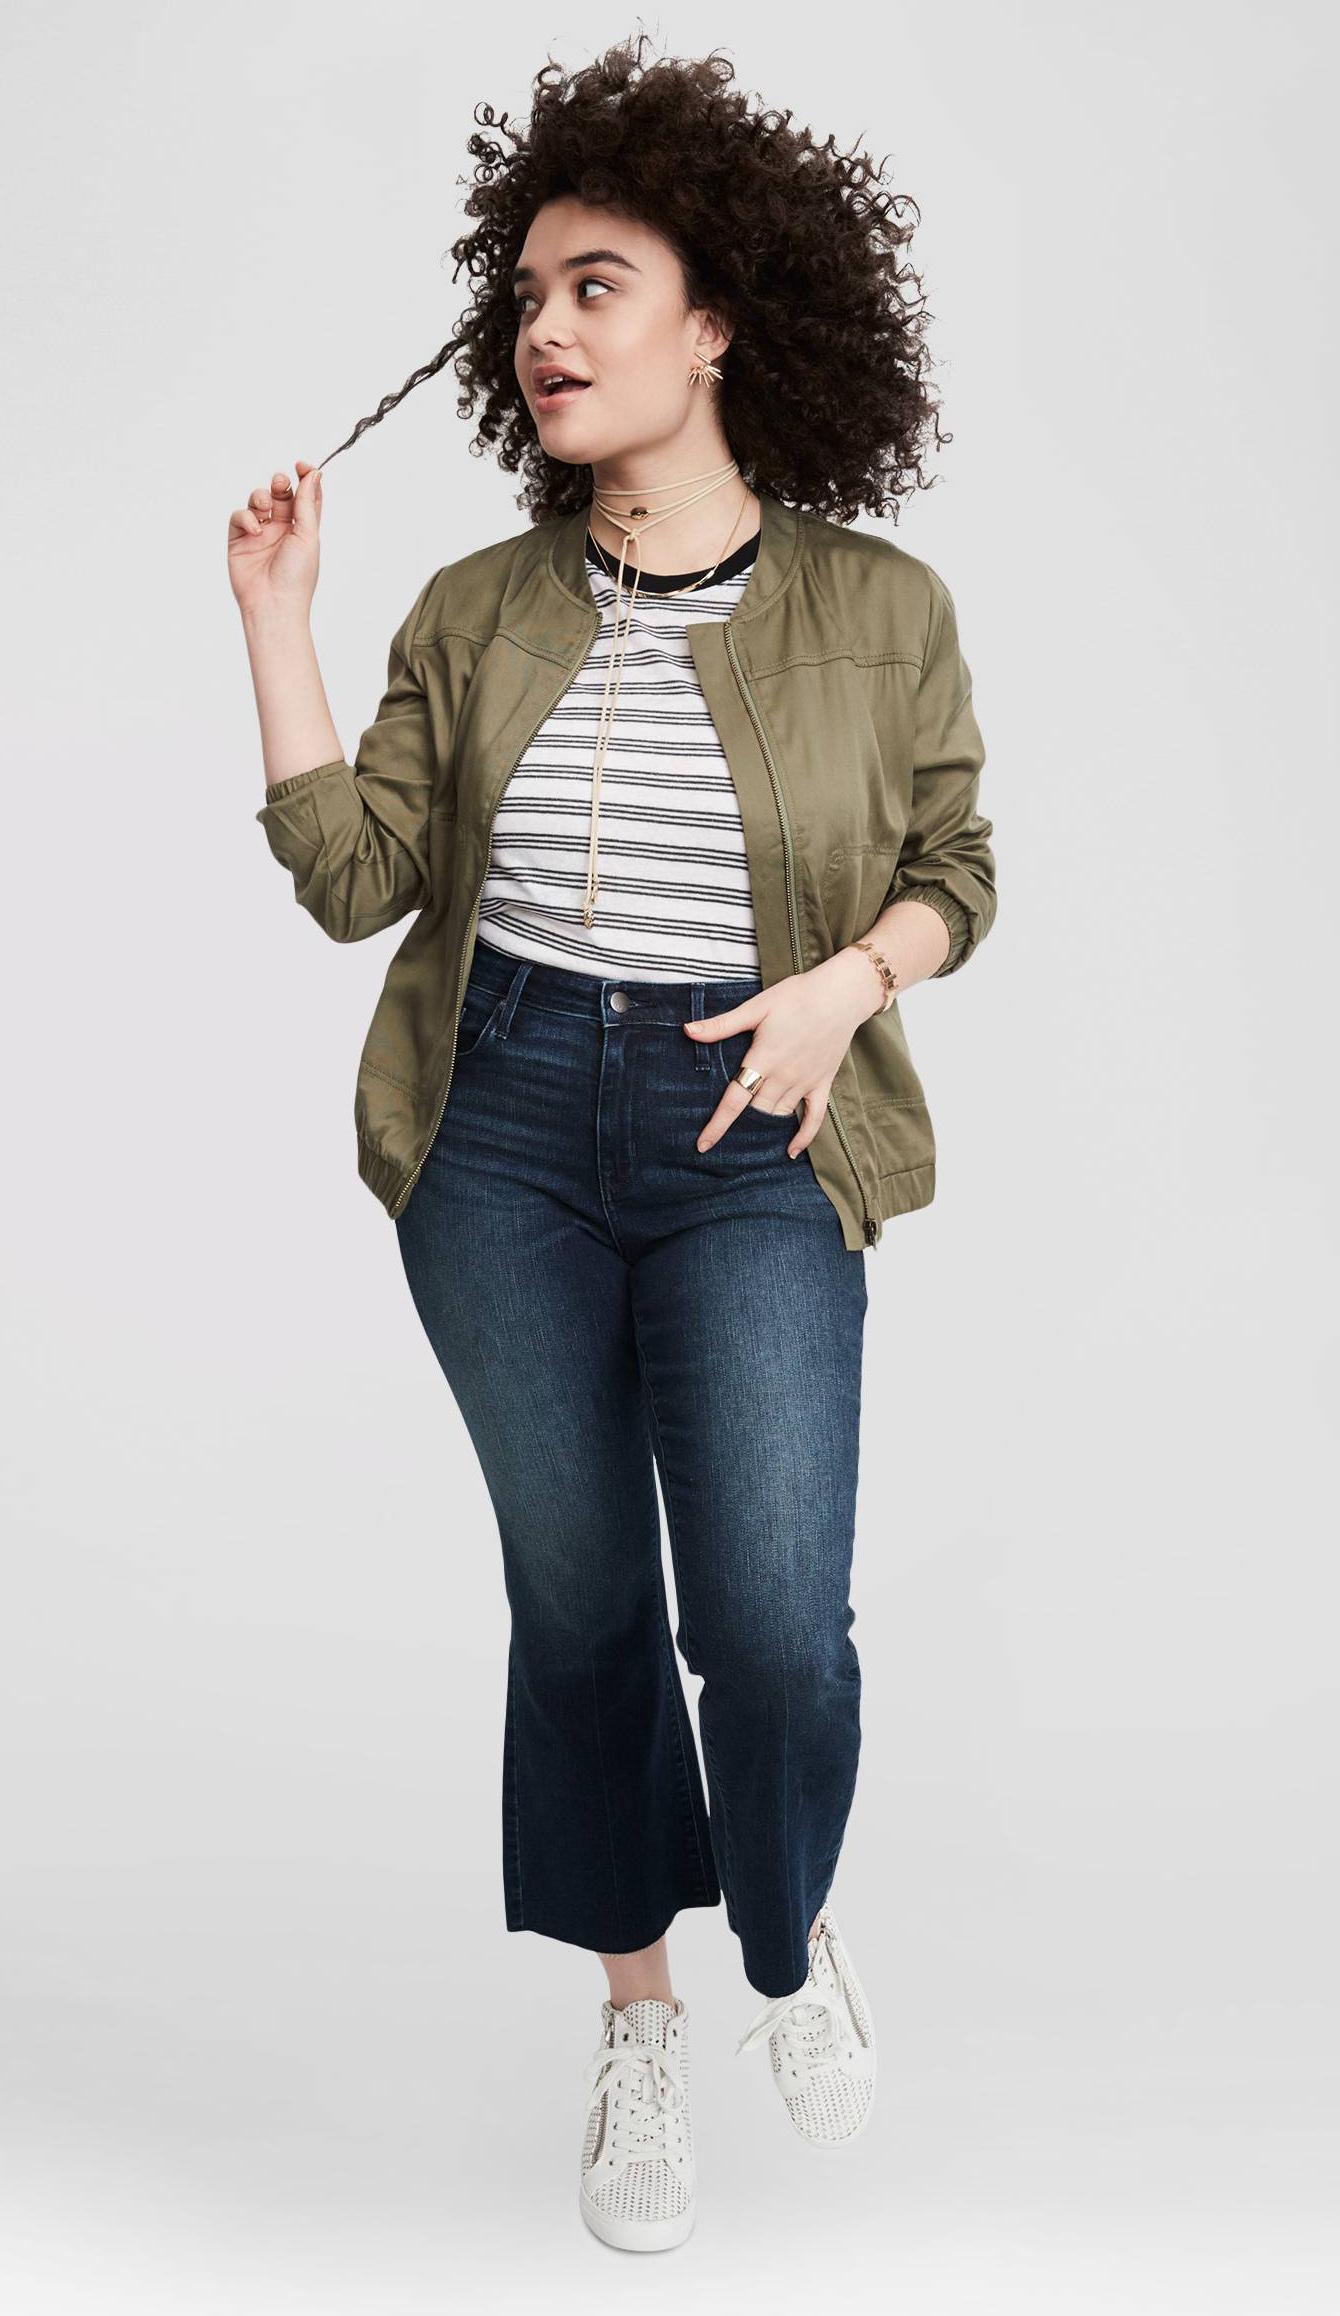 blue-navy-crop-jeans-white-shoe-sneakers-black-tee-stripe-green-olive-jacket-bomber-choker-howtowear-fashion-style-outfit-spring-summer-brun-weekend.jpg